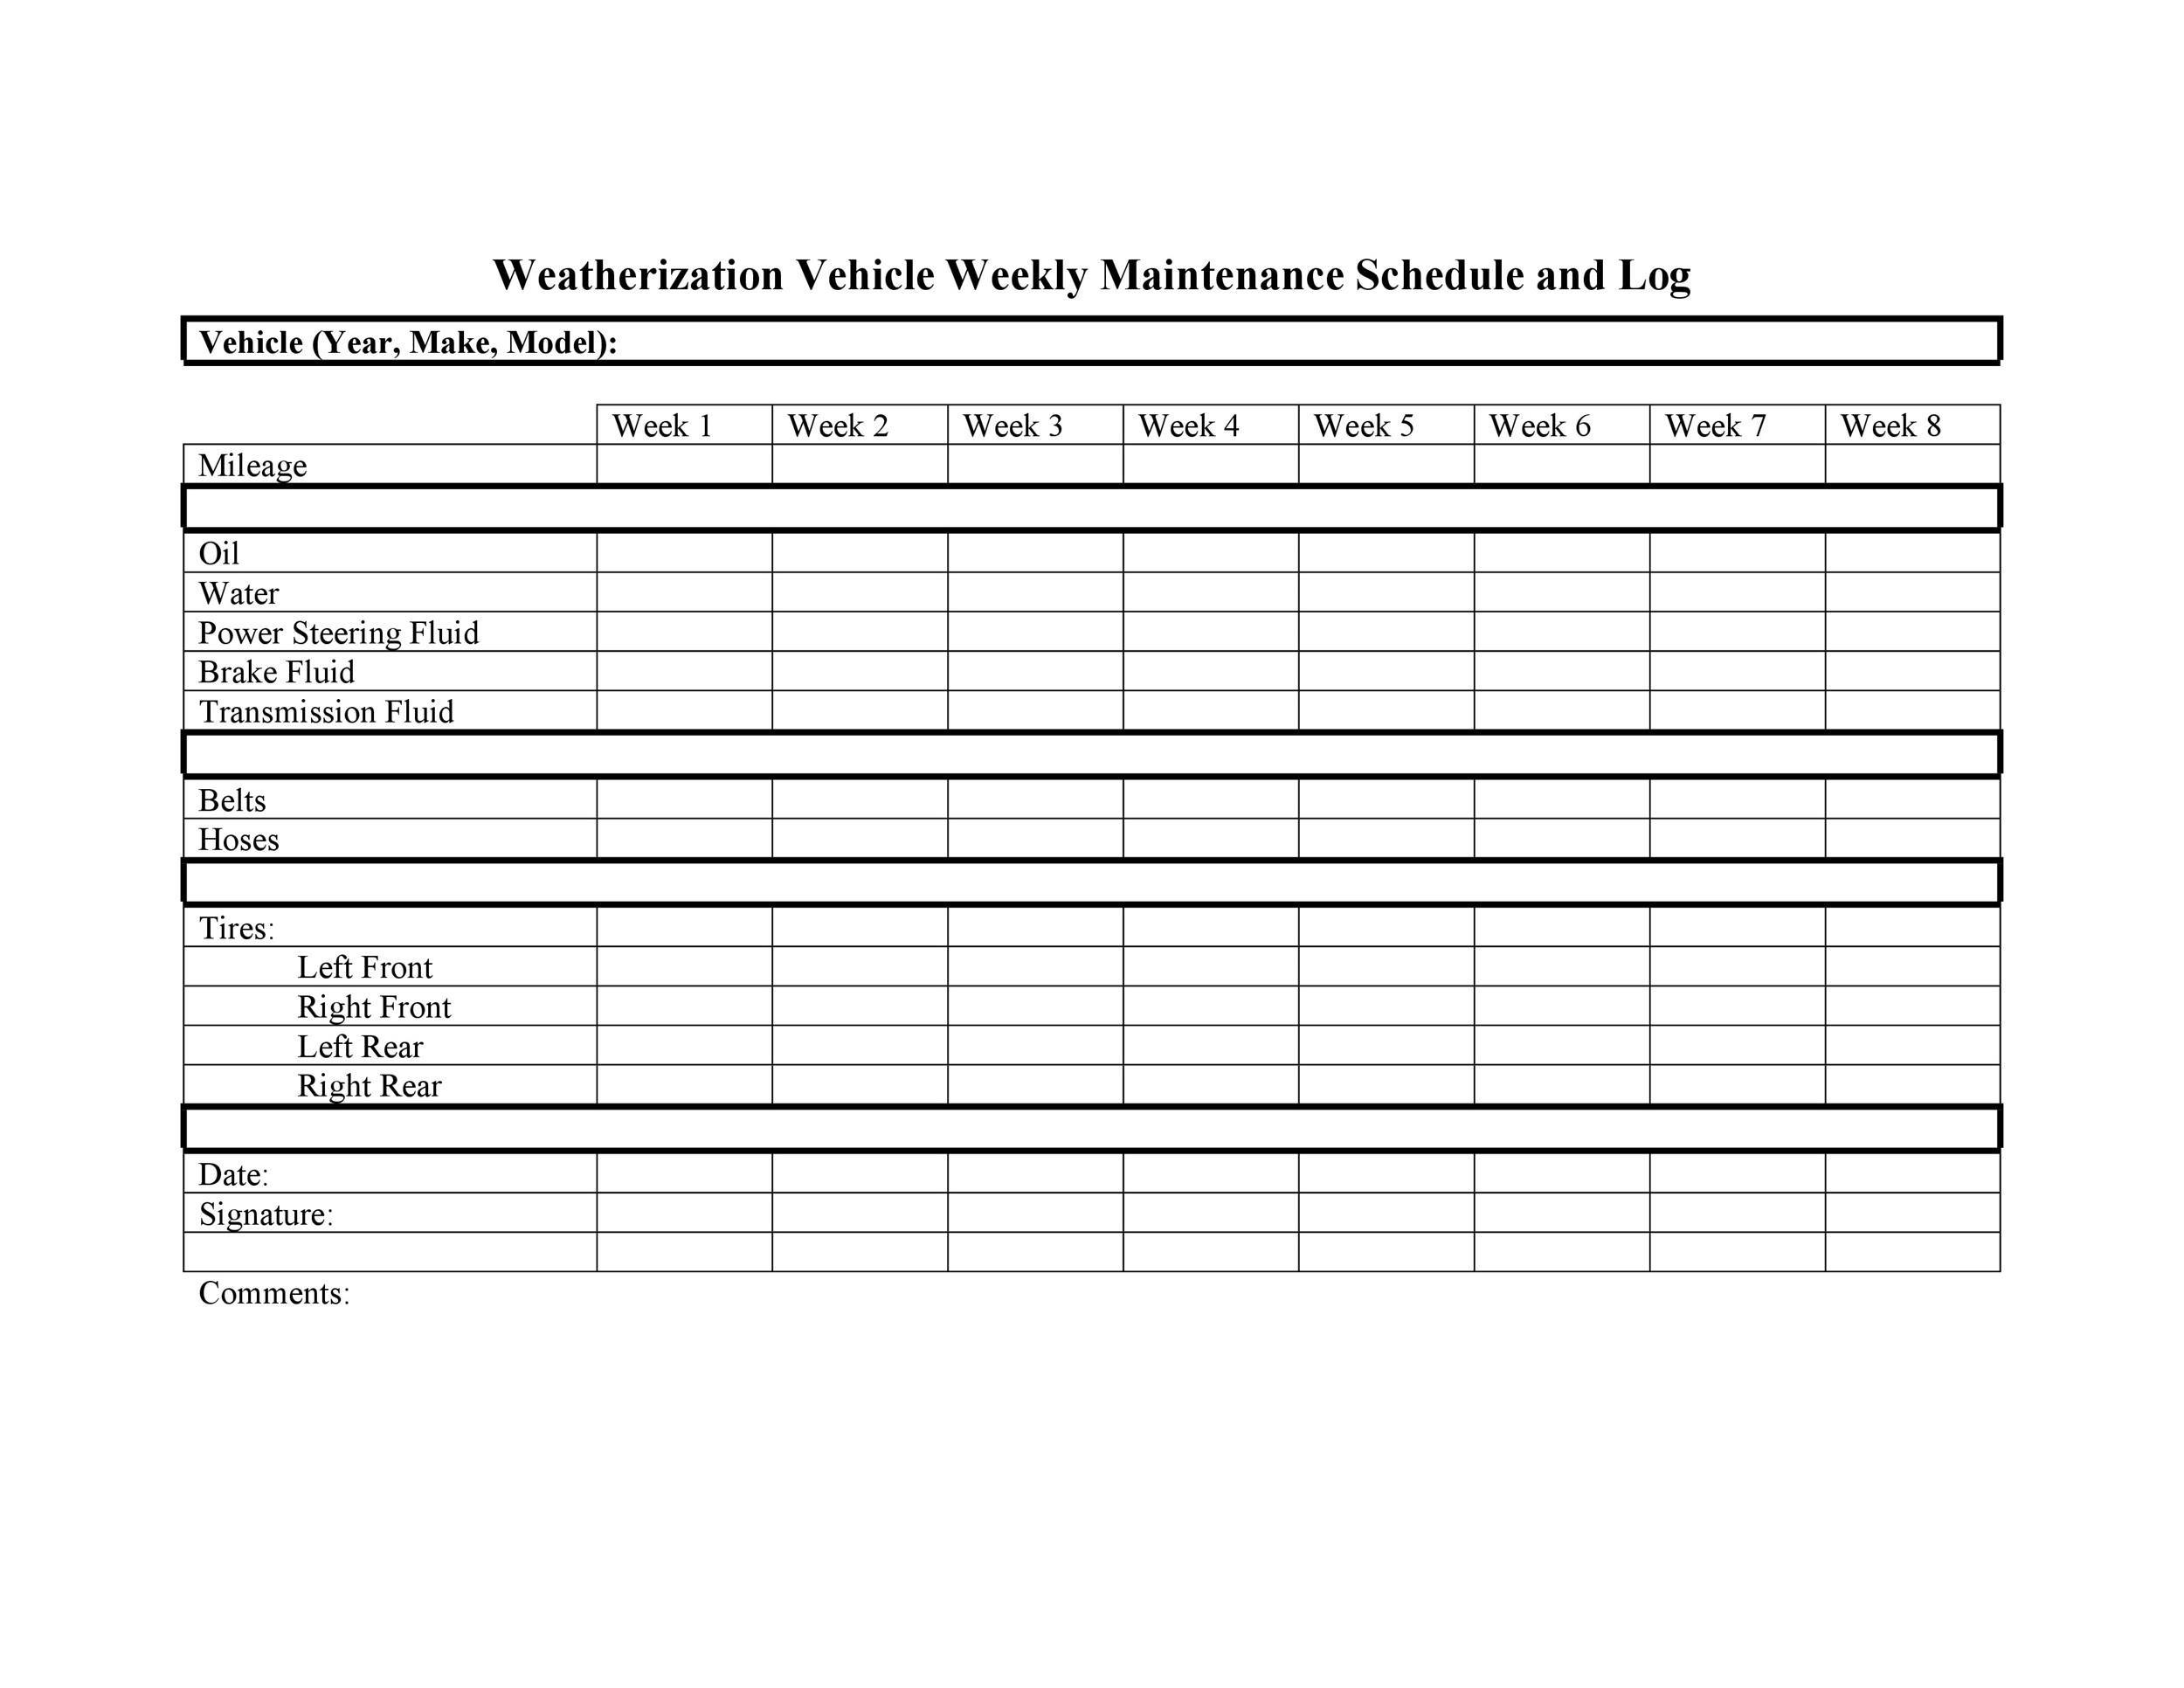 005 Best Car Maintenance Schedule Template High Resolution  Vehicle Preventive Excel LogFull